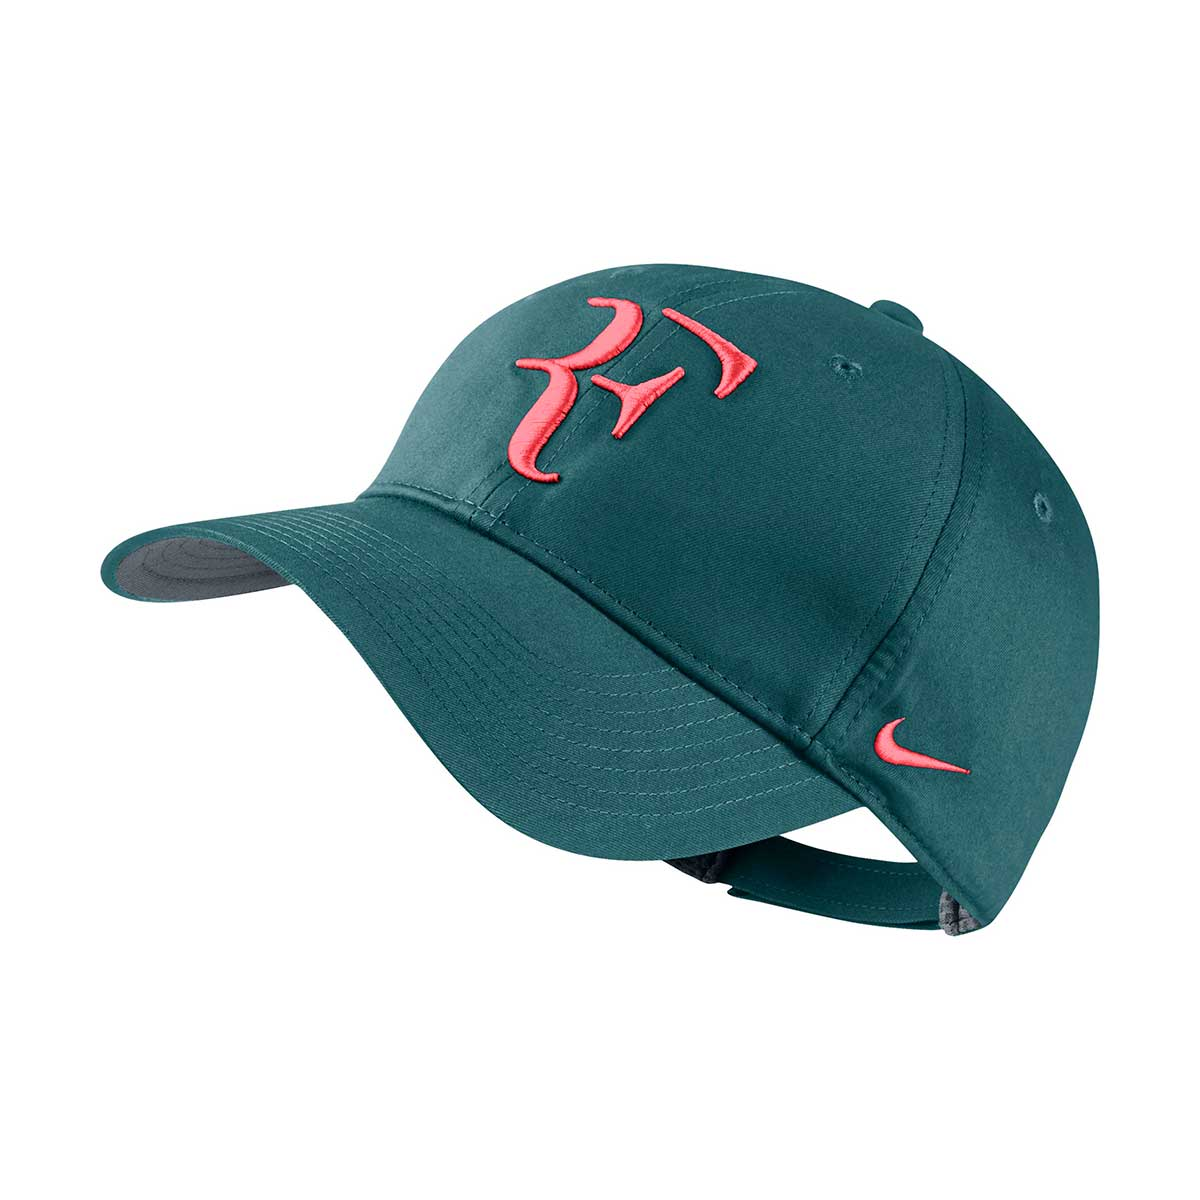 Buy Nike RF Cap Online India fa5f8755b3